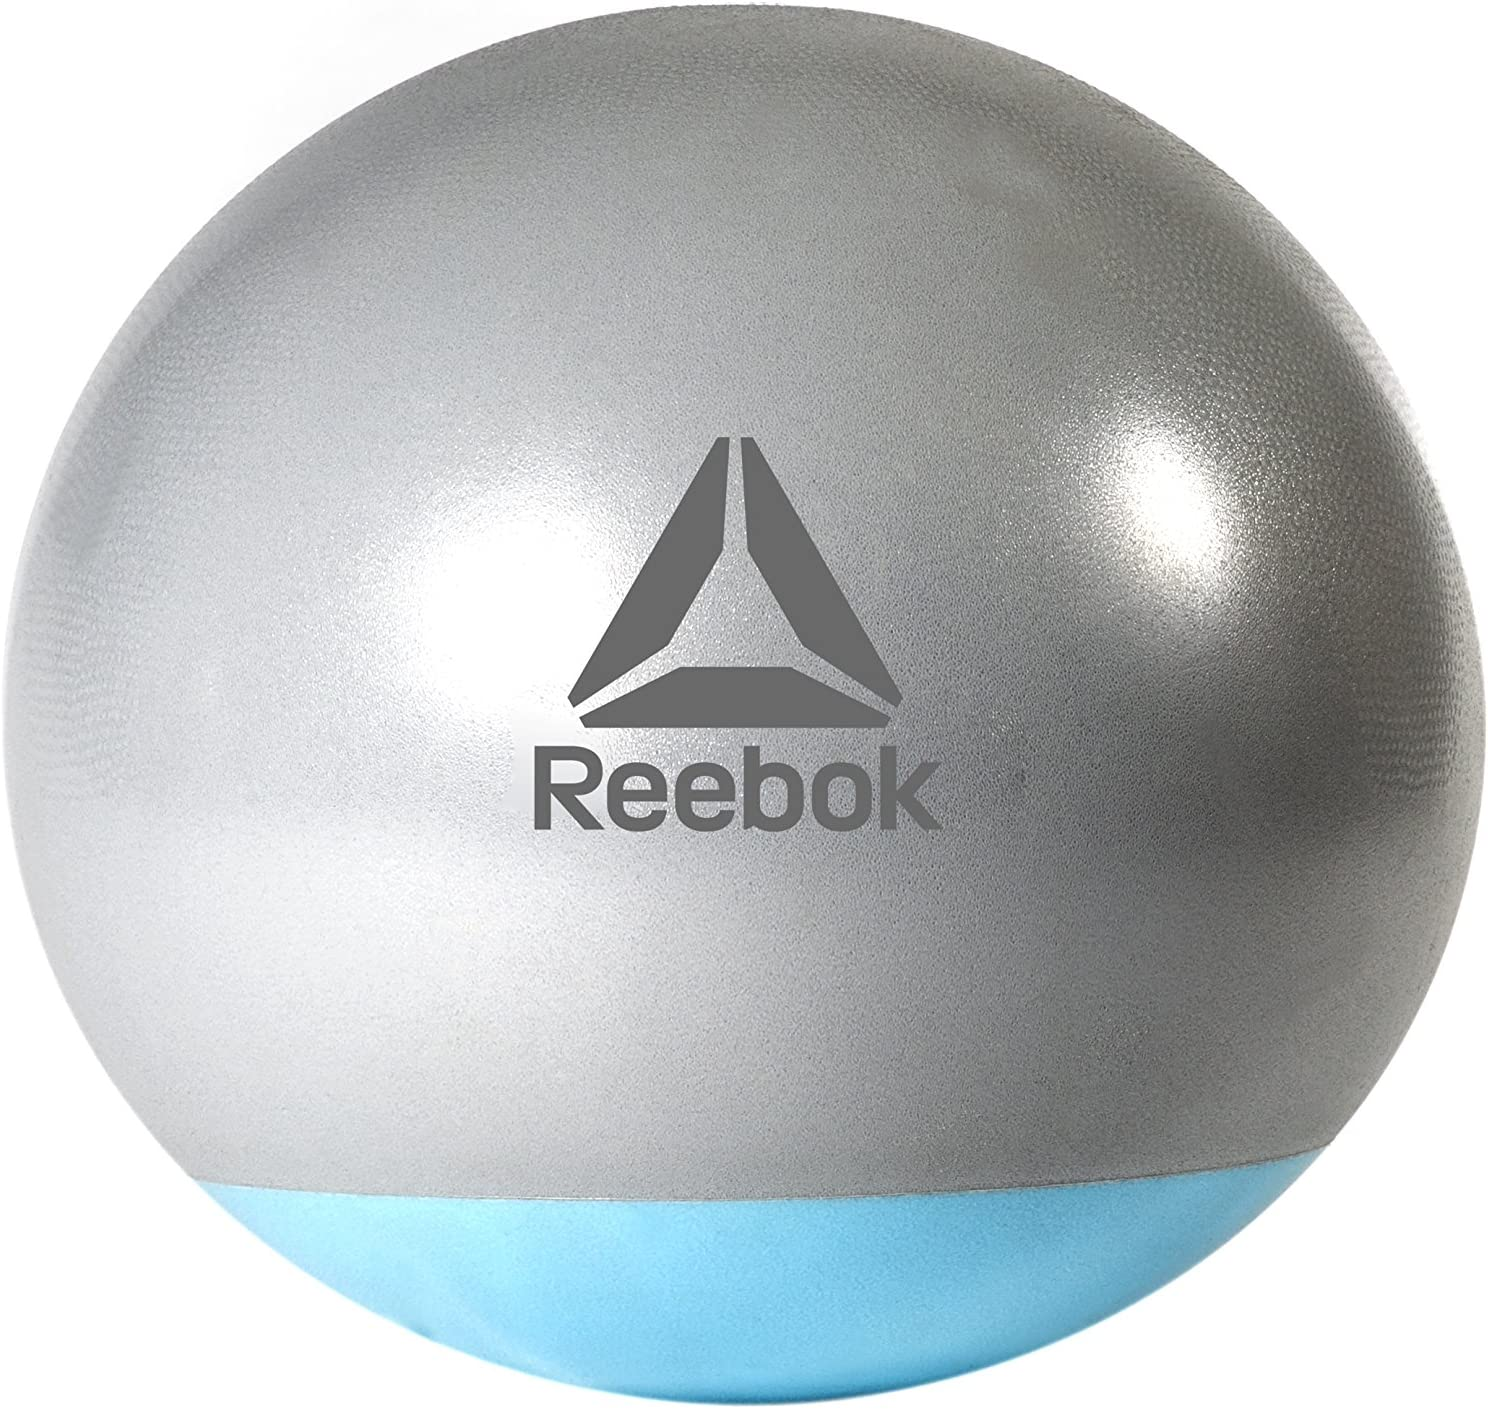 Reebok RAB-40016BL Pelota de Gimnasia, Unisex Adulto, Gris, 65 cm ...